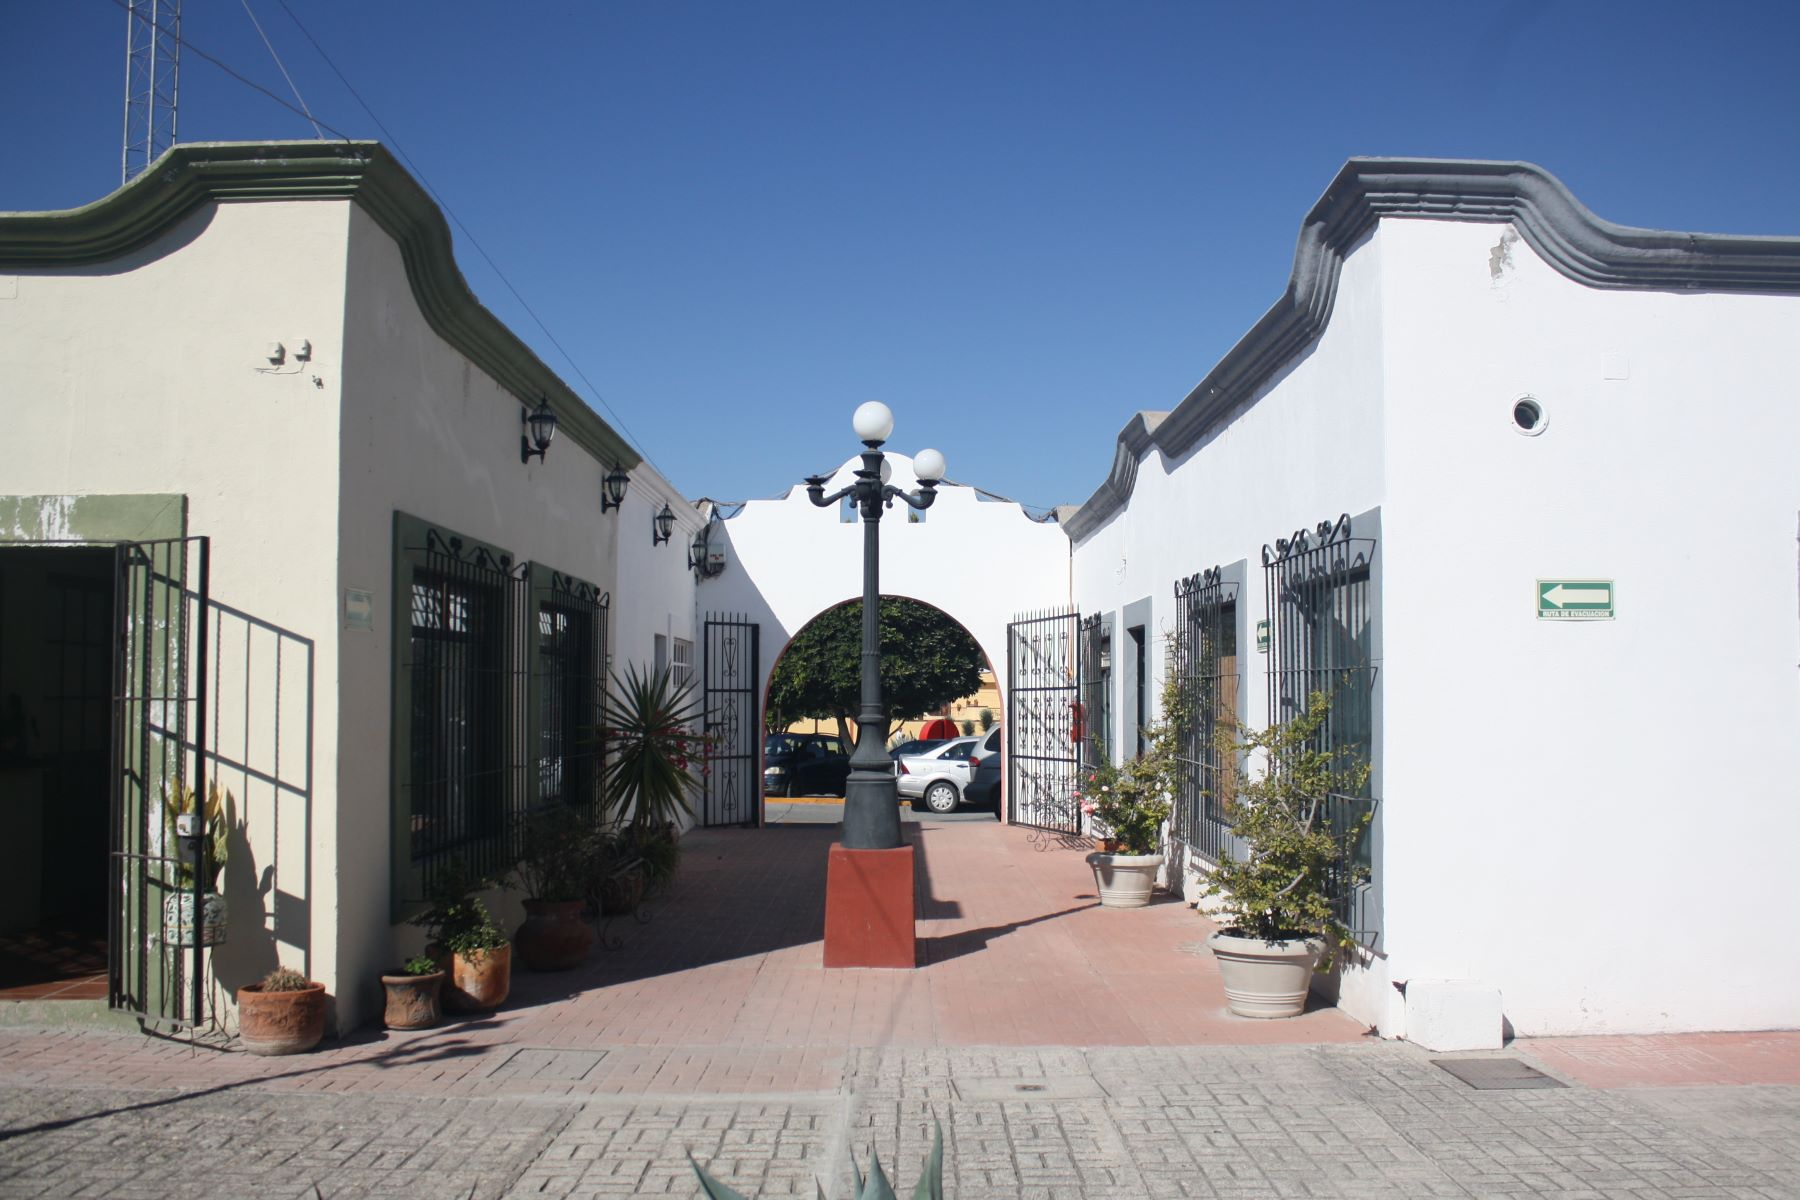 Villa per Vendita alle ore Plaza Pueblito San Antonio, San Miguel De Allende, Guanajuato Messico